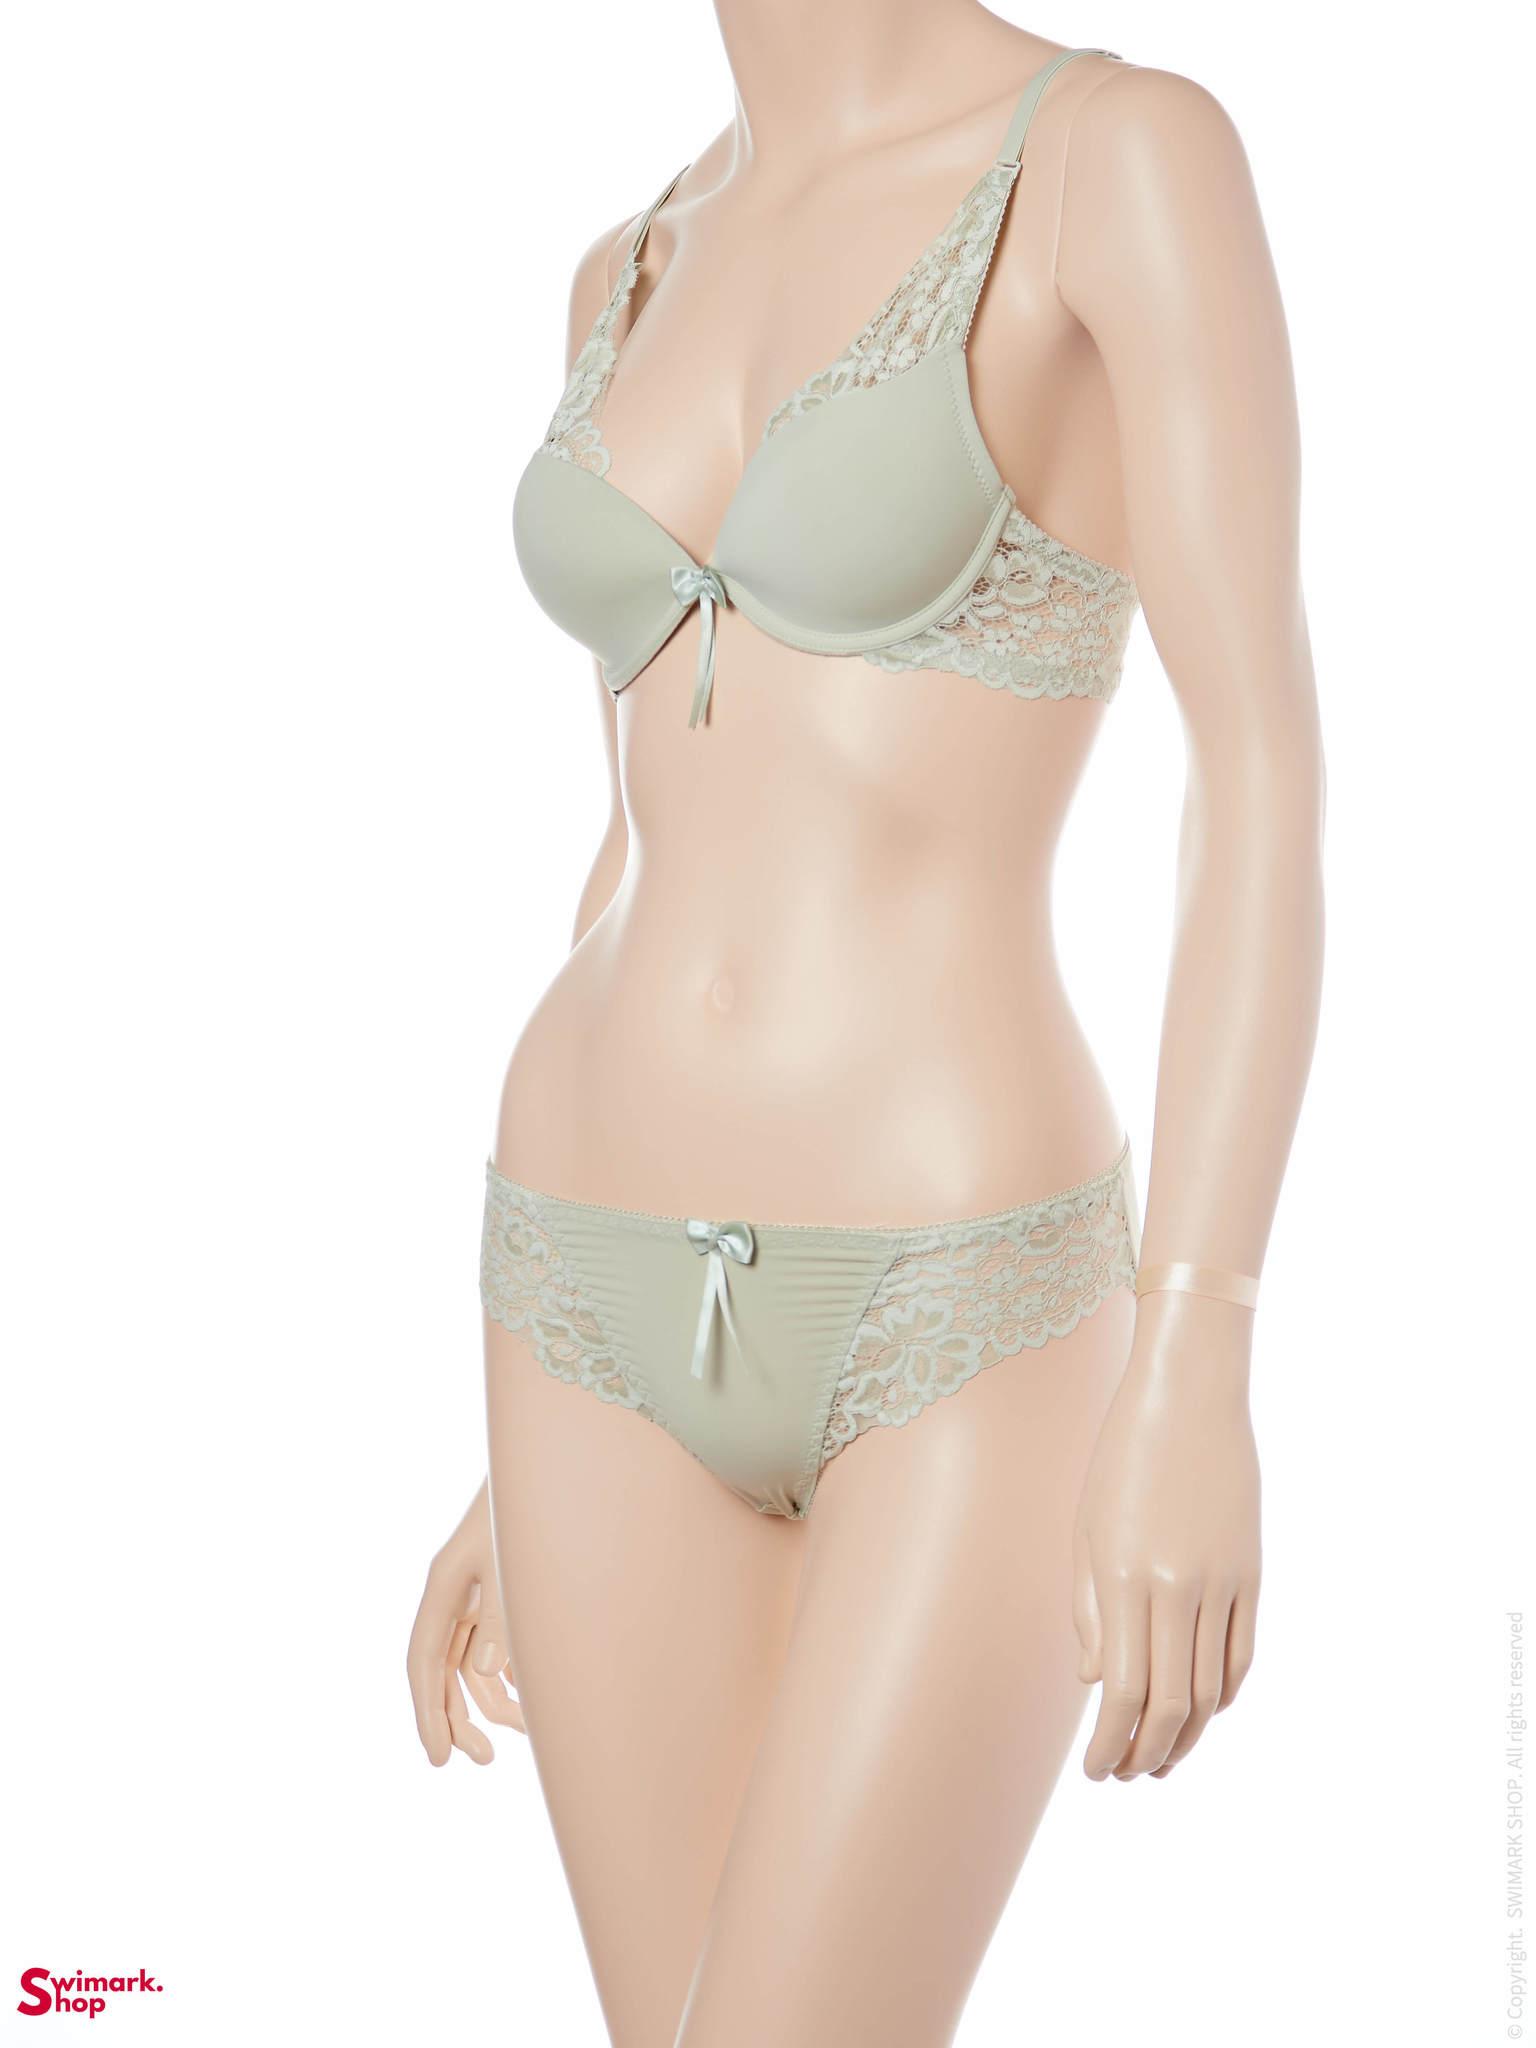 Комплекты Комплект женский TSUTEY T1469 _swimarkshop51620.jpg